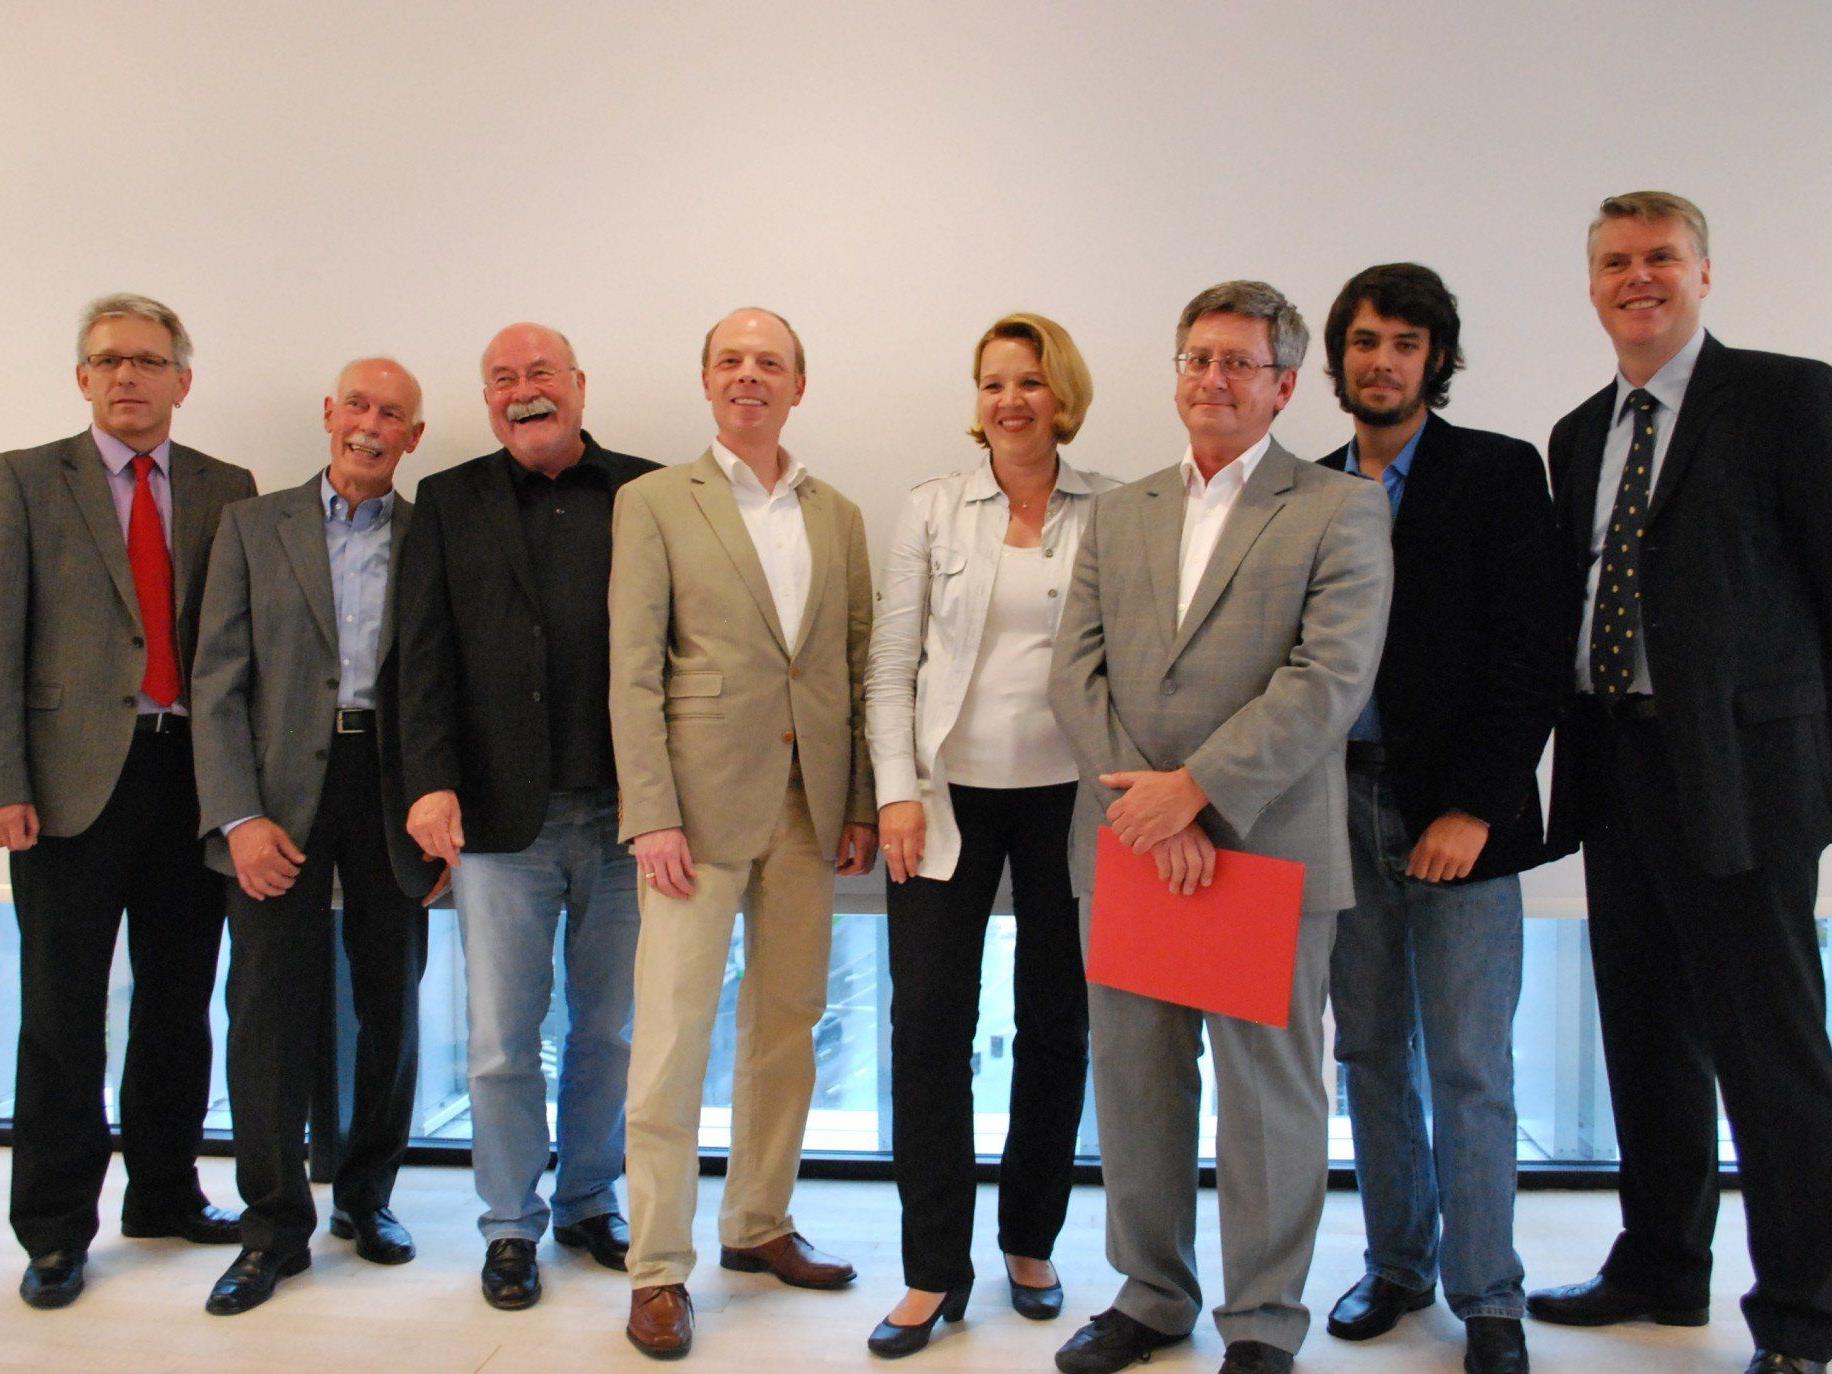 Udo Rainer, Anton Ulmer, Nolde Luger, Harald Rhomberg, BM Andrea Kaufmann, Christoph Volaucnik, Ulrich Wendl, Werner Matt (vl)